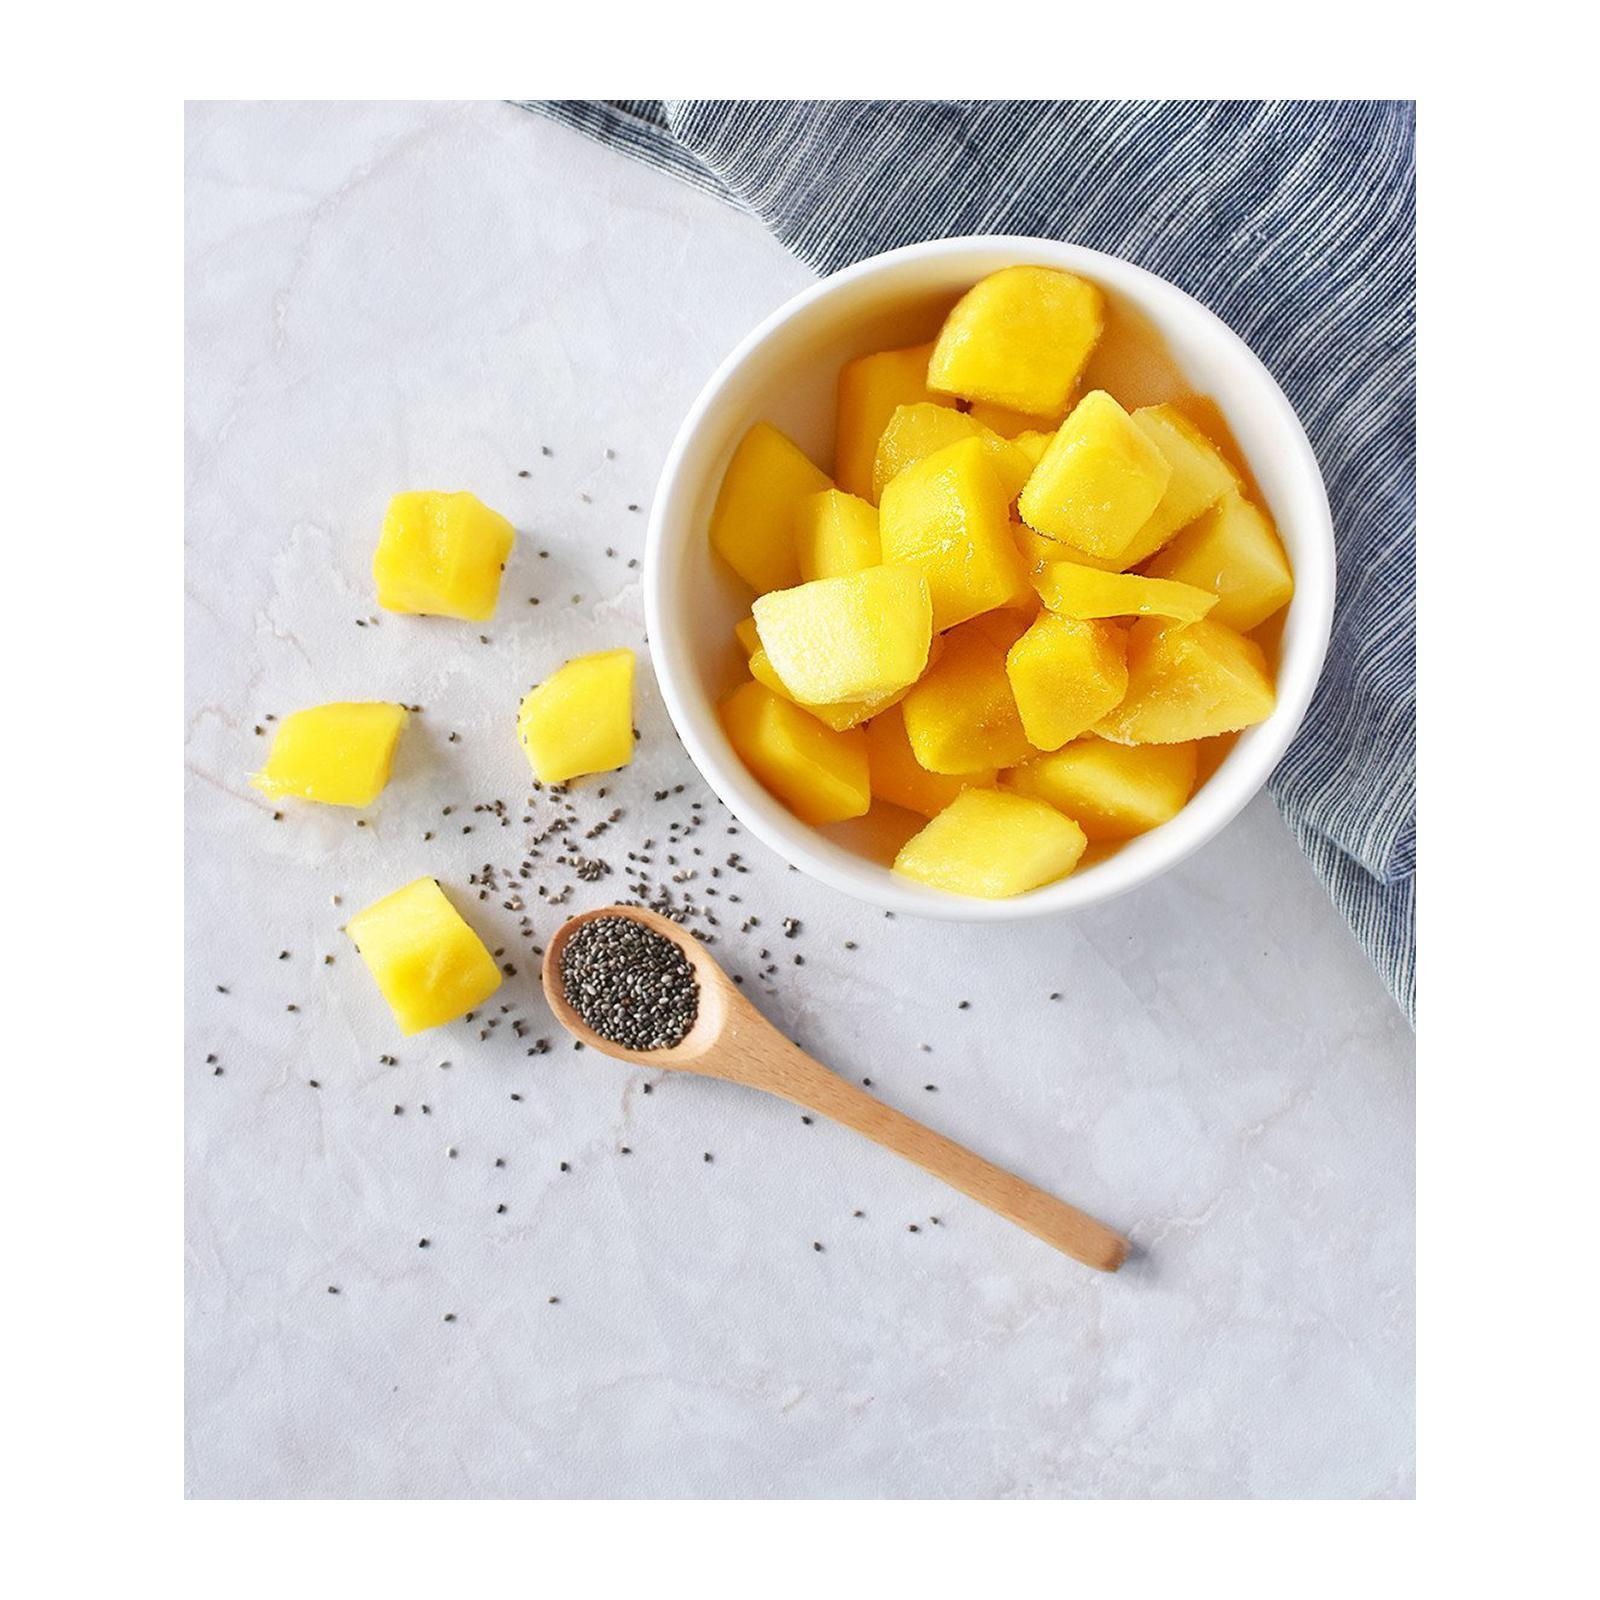 Sashas Fine Foods Speyfruit Frozen Mango - Frozen By Redmart.